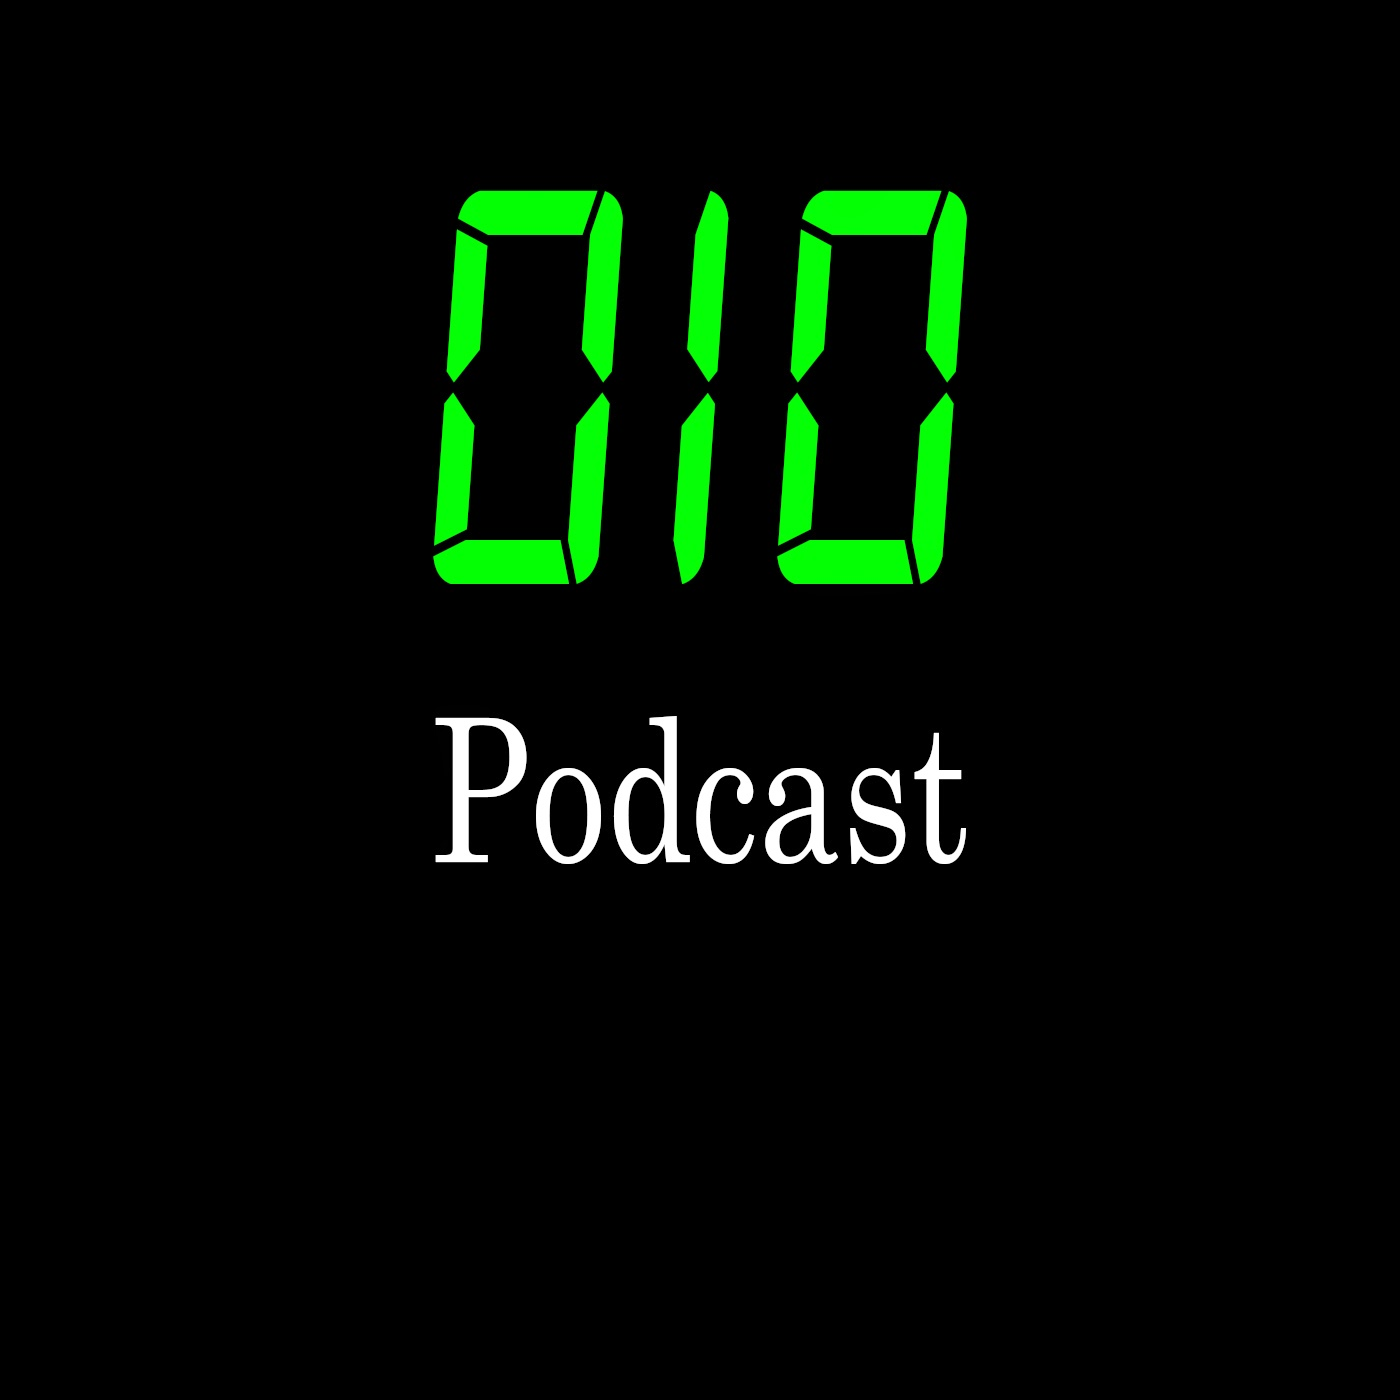 010 Podcast: 2015